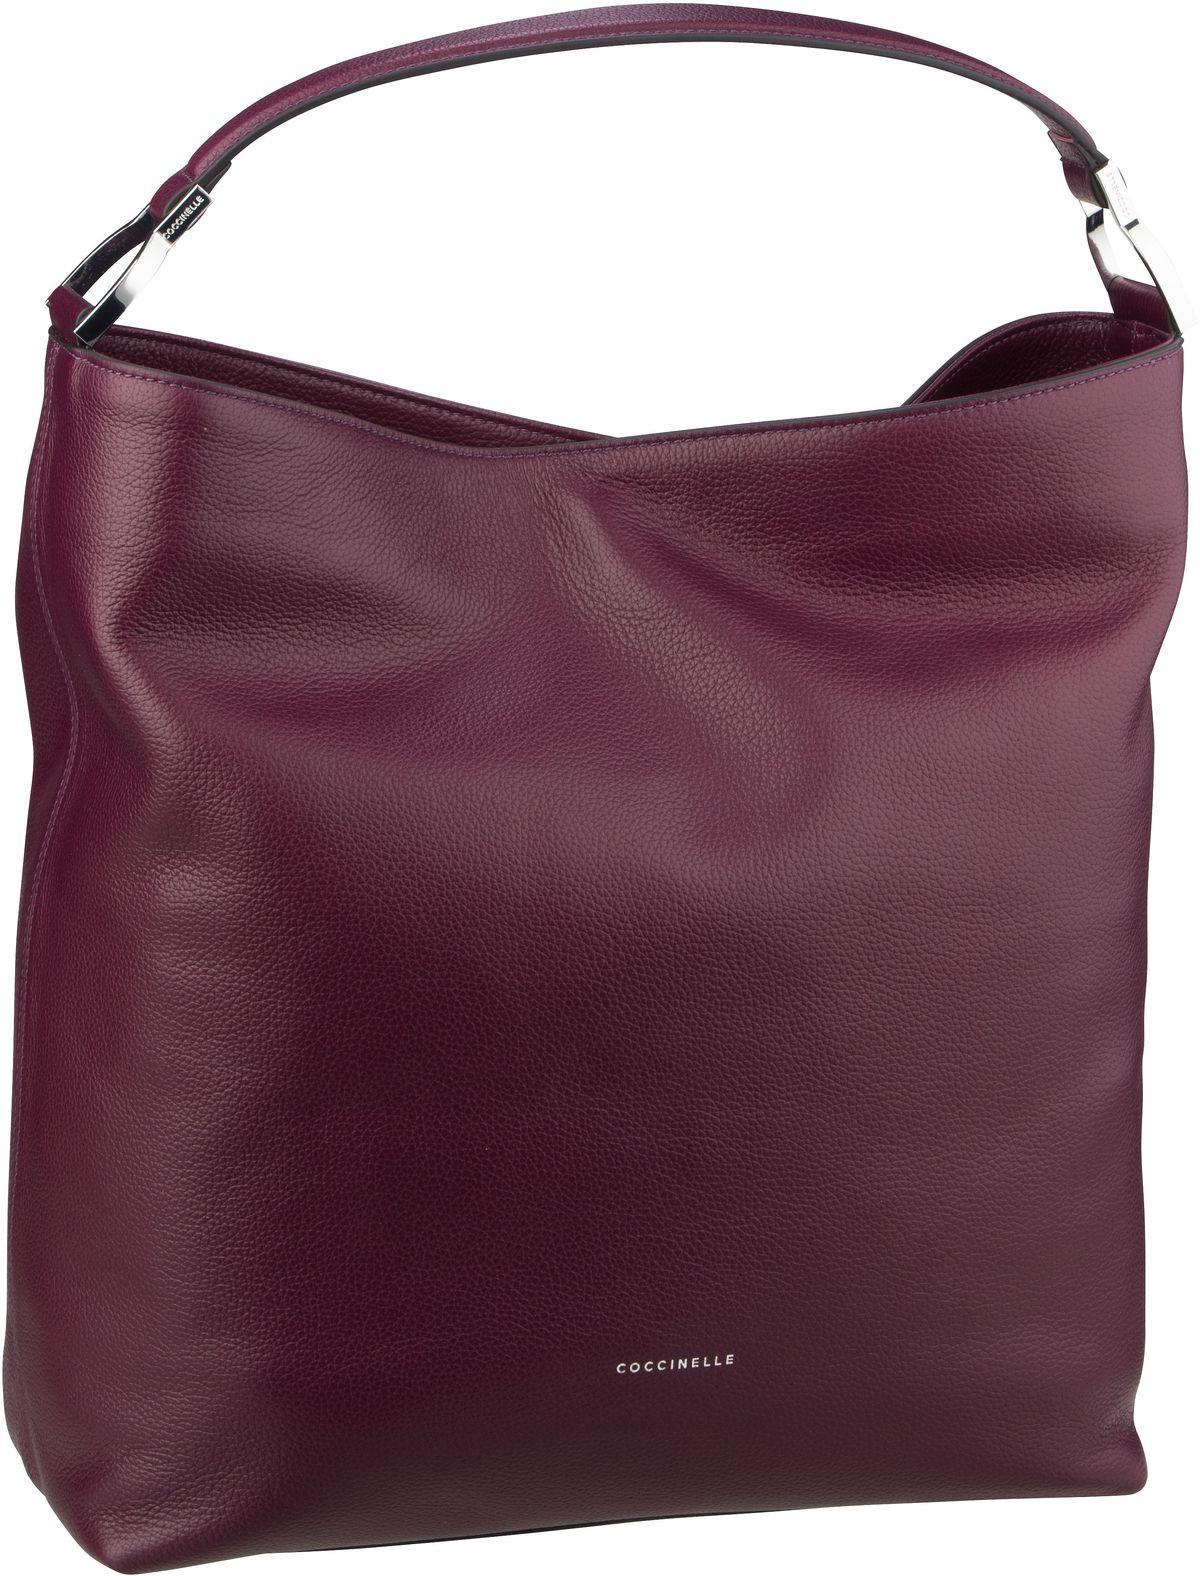 Handtasche Keyla 1301 Plum